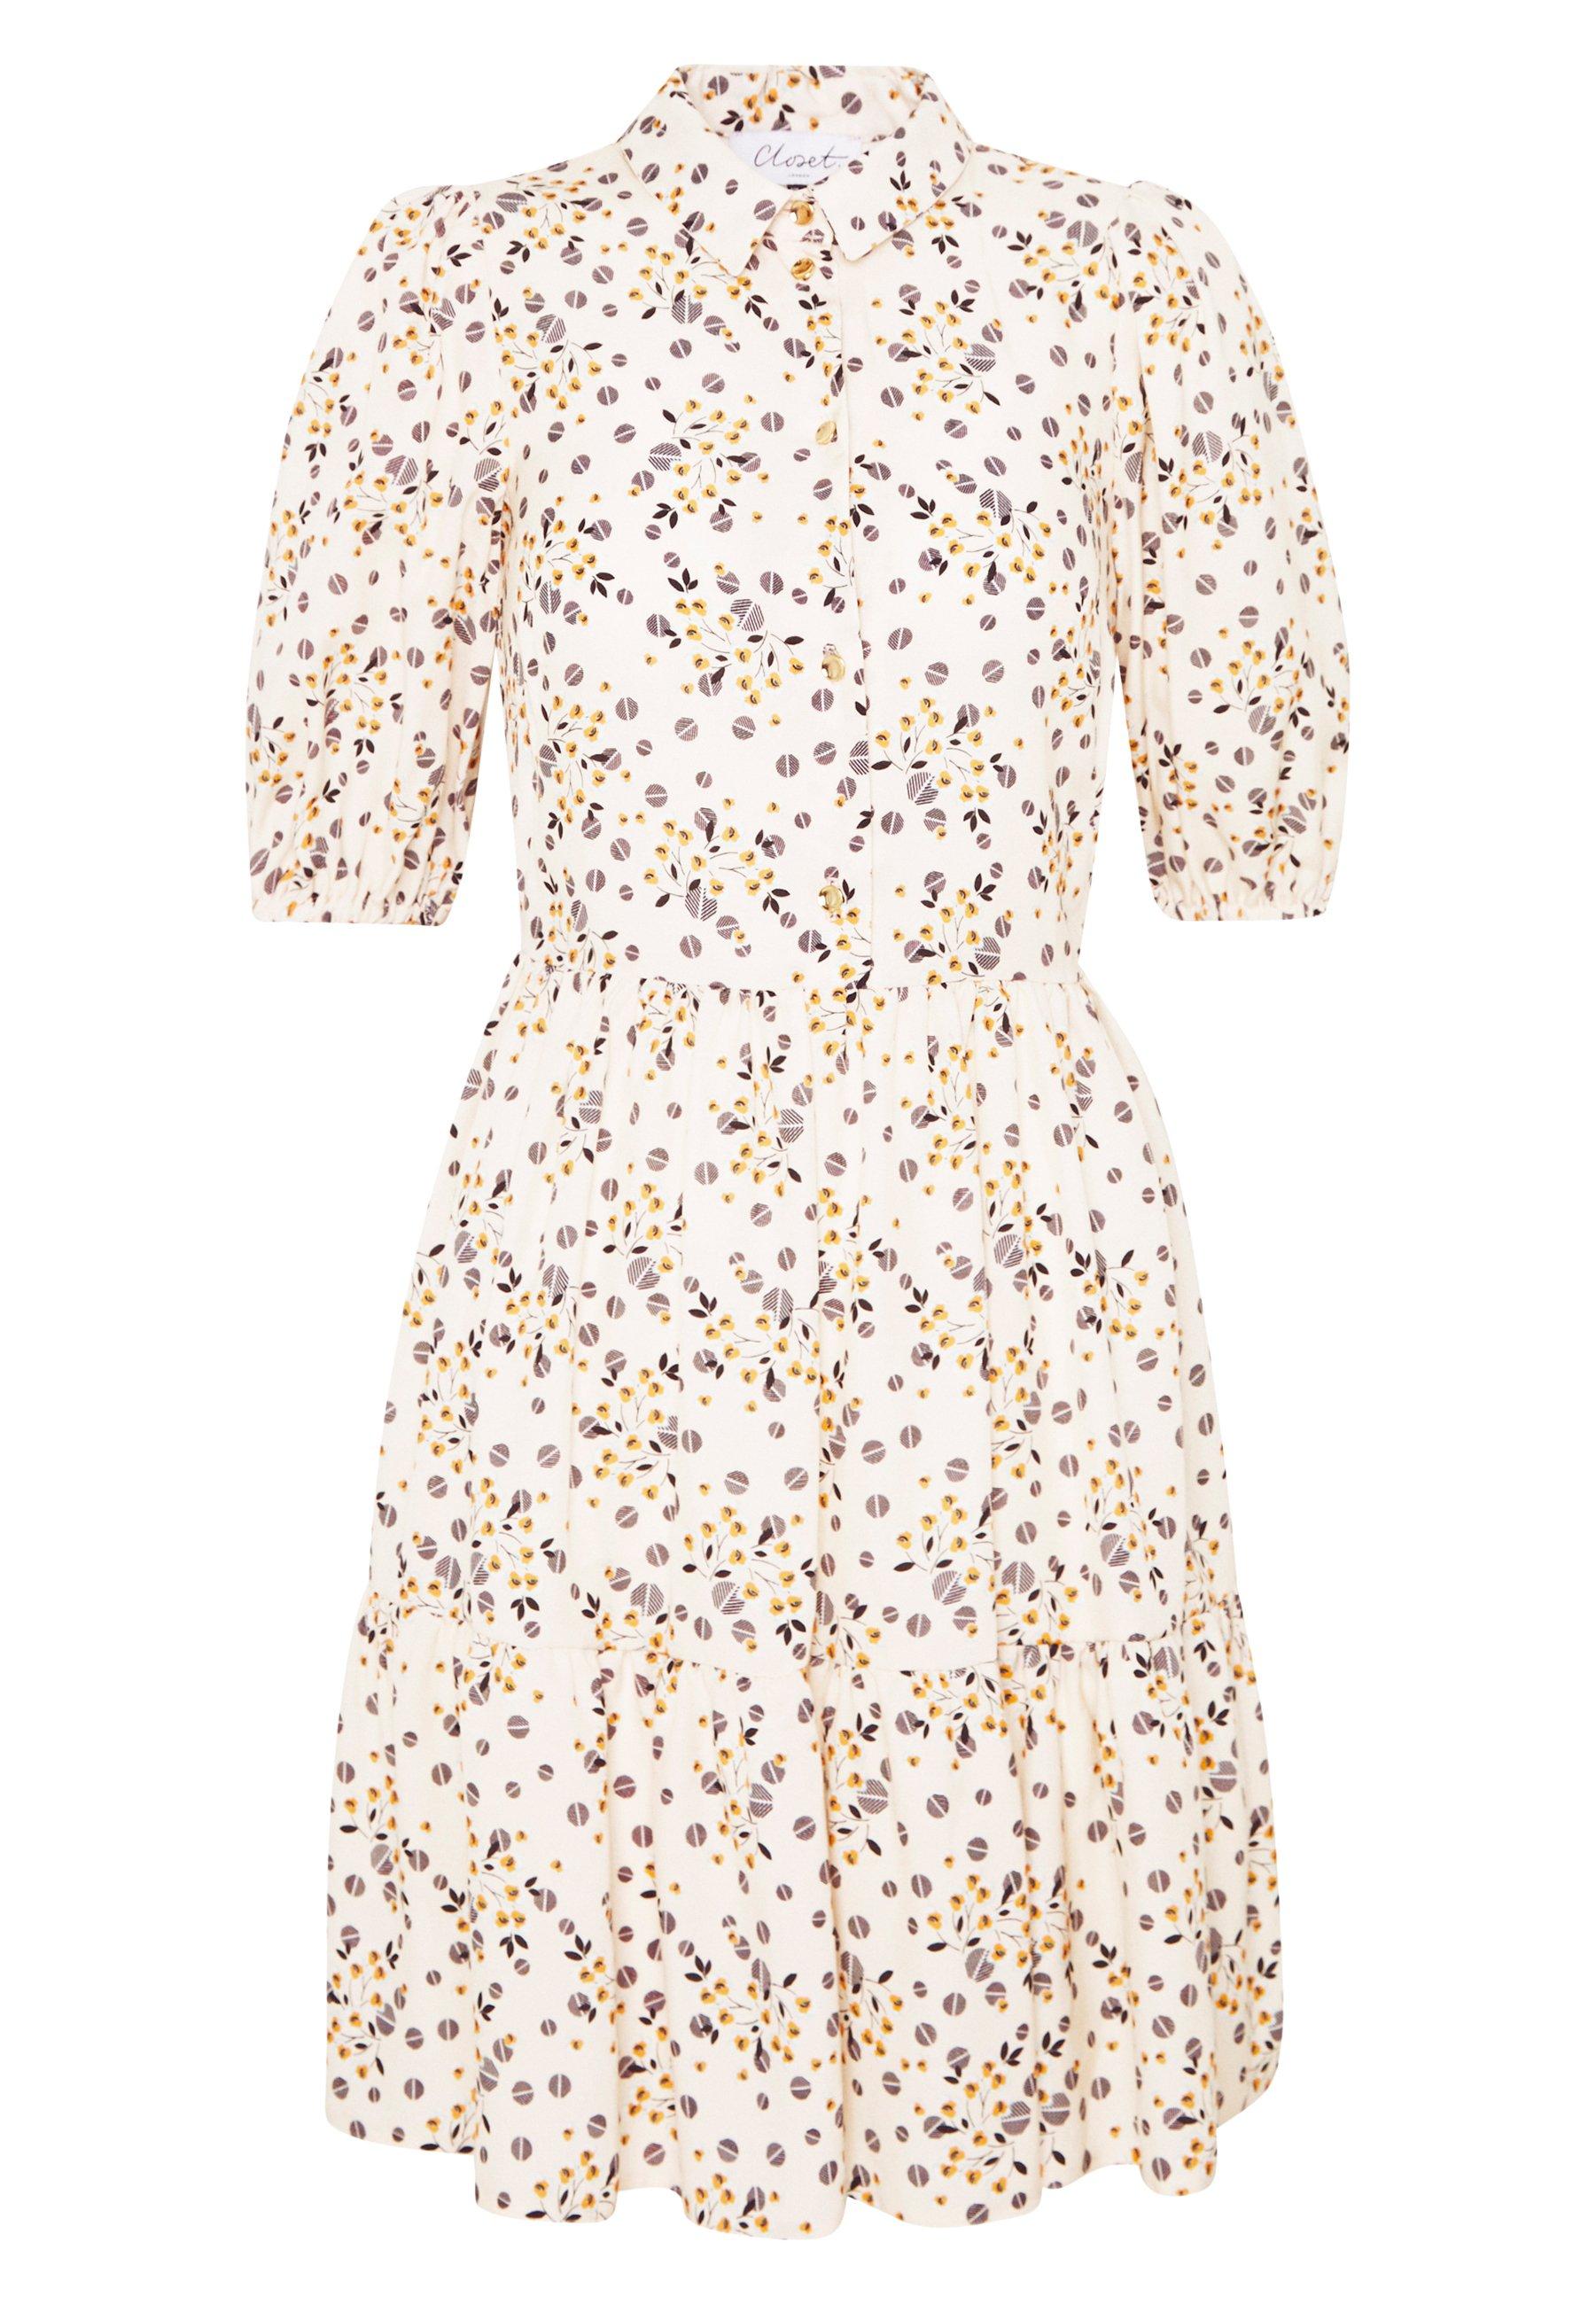 Closet Gathered Shirt Dress - Robe Chemise Beige